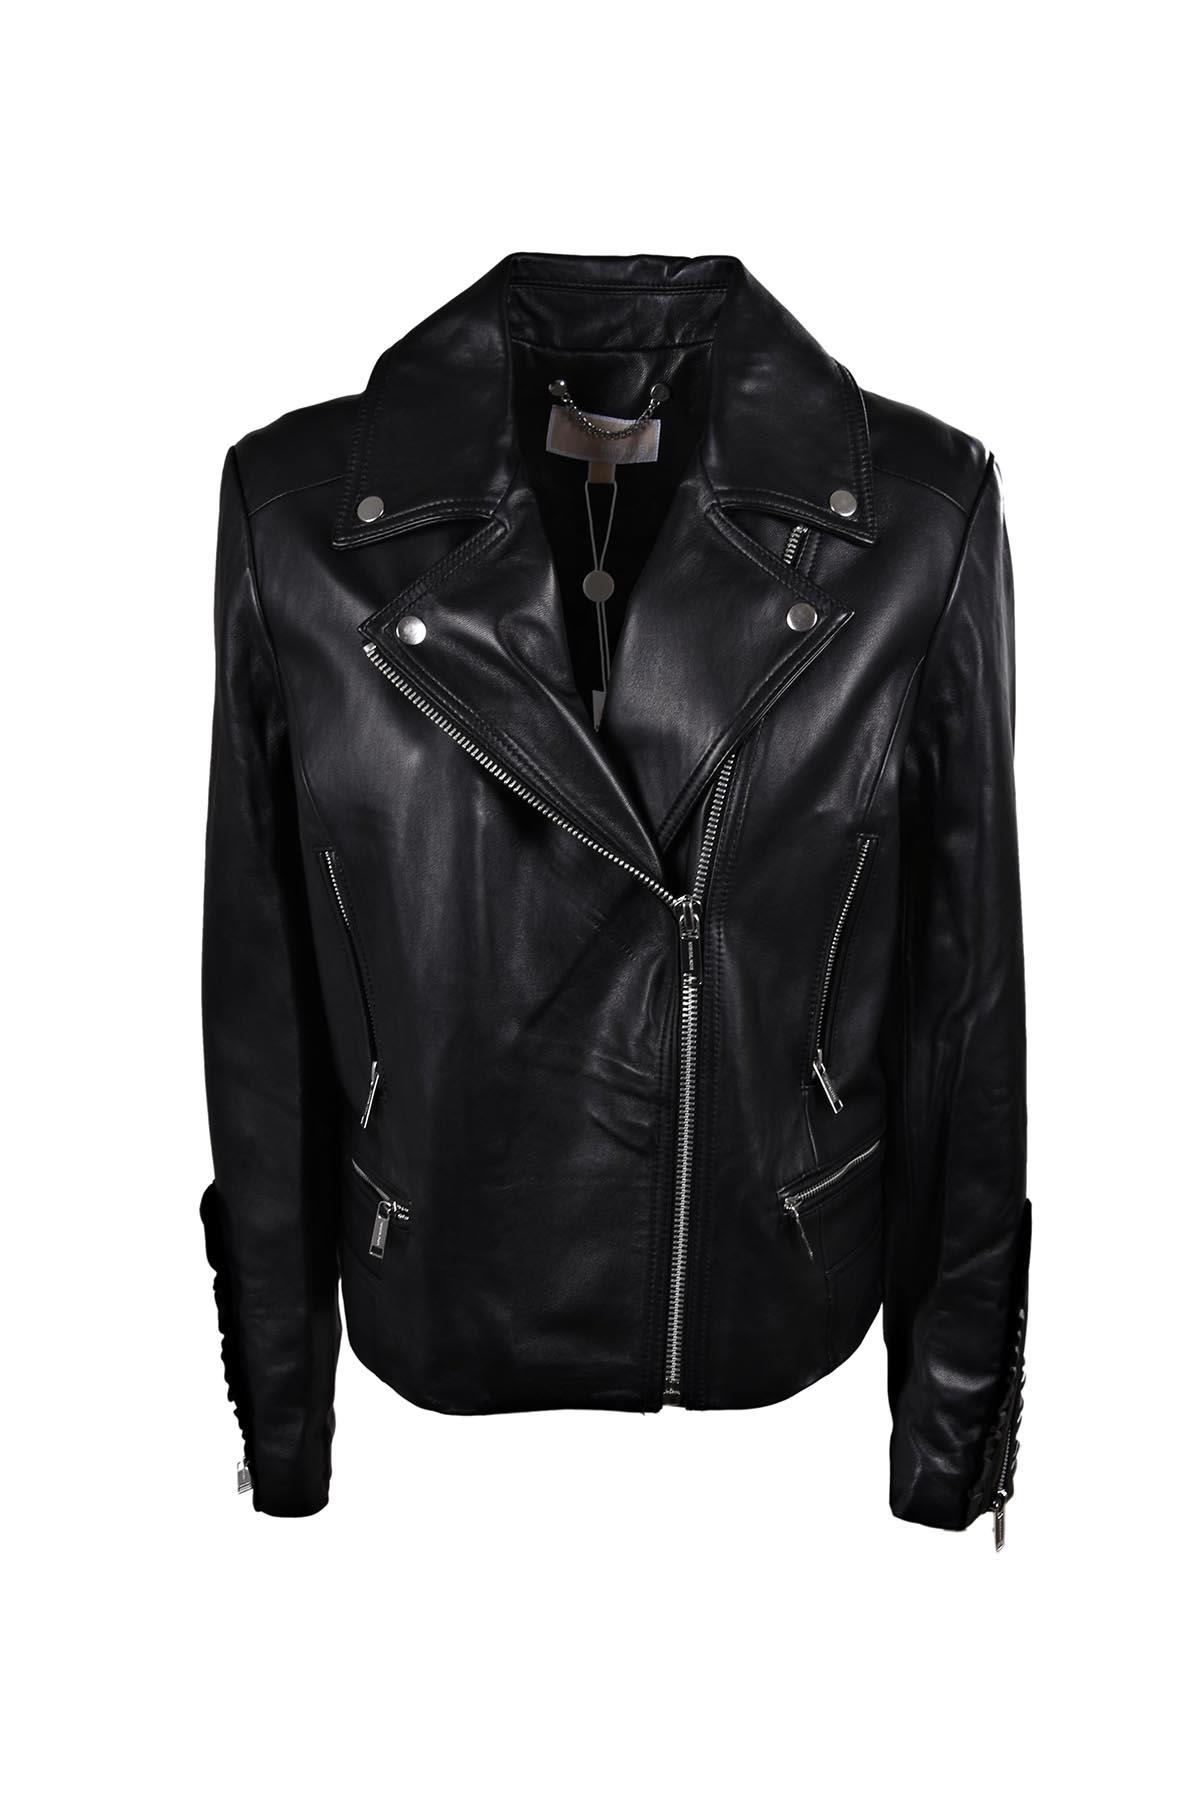 Michael Kors Frill Moto Jacket